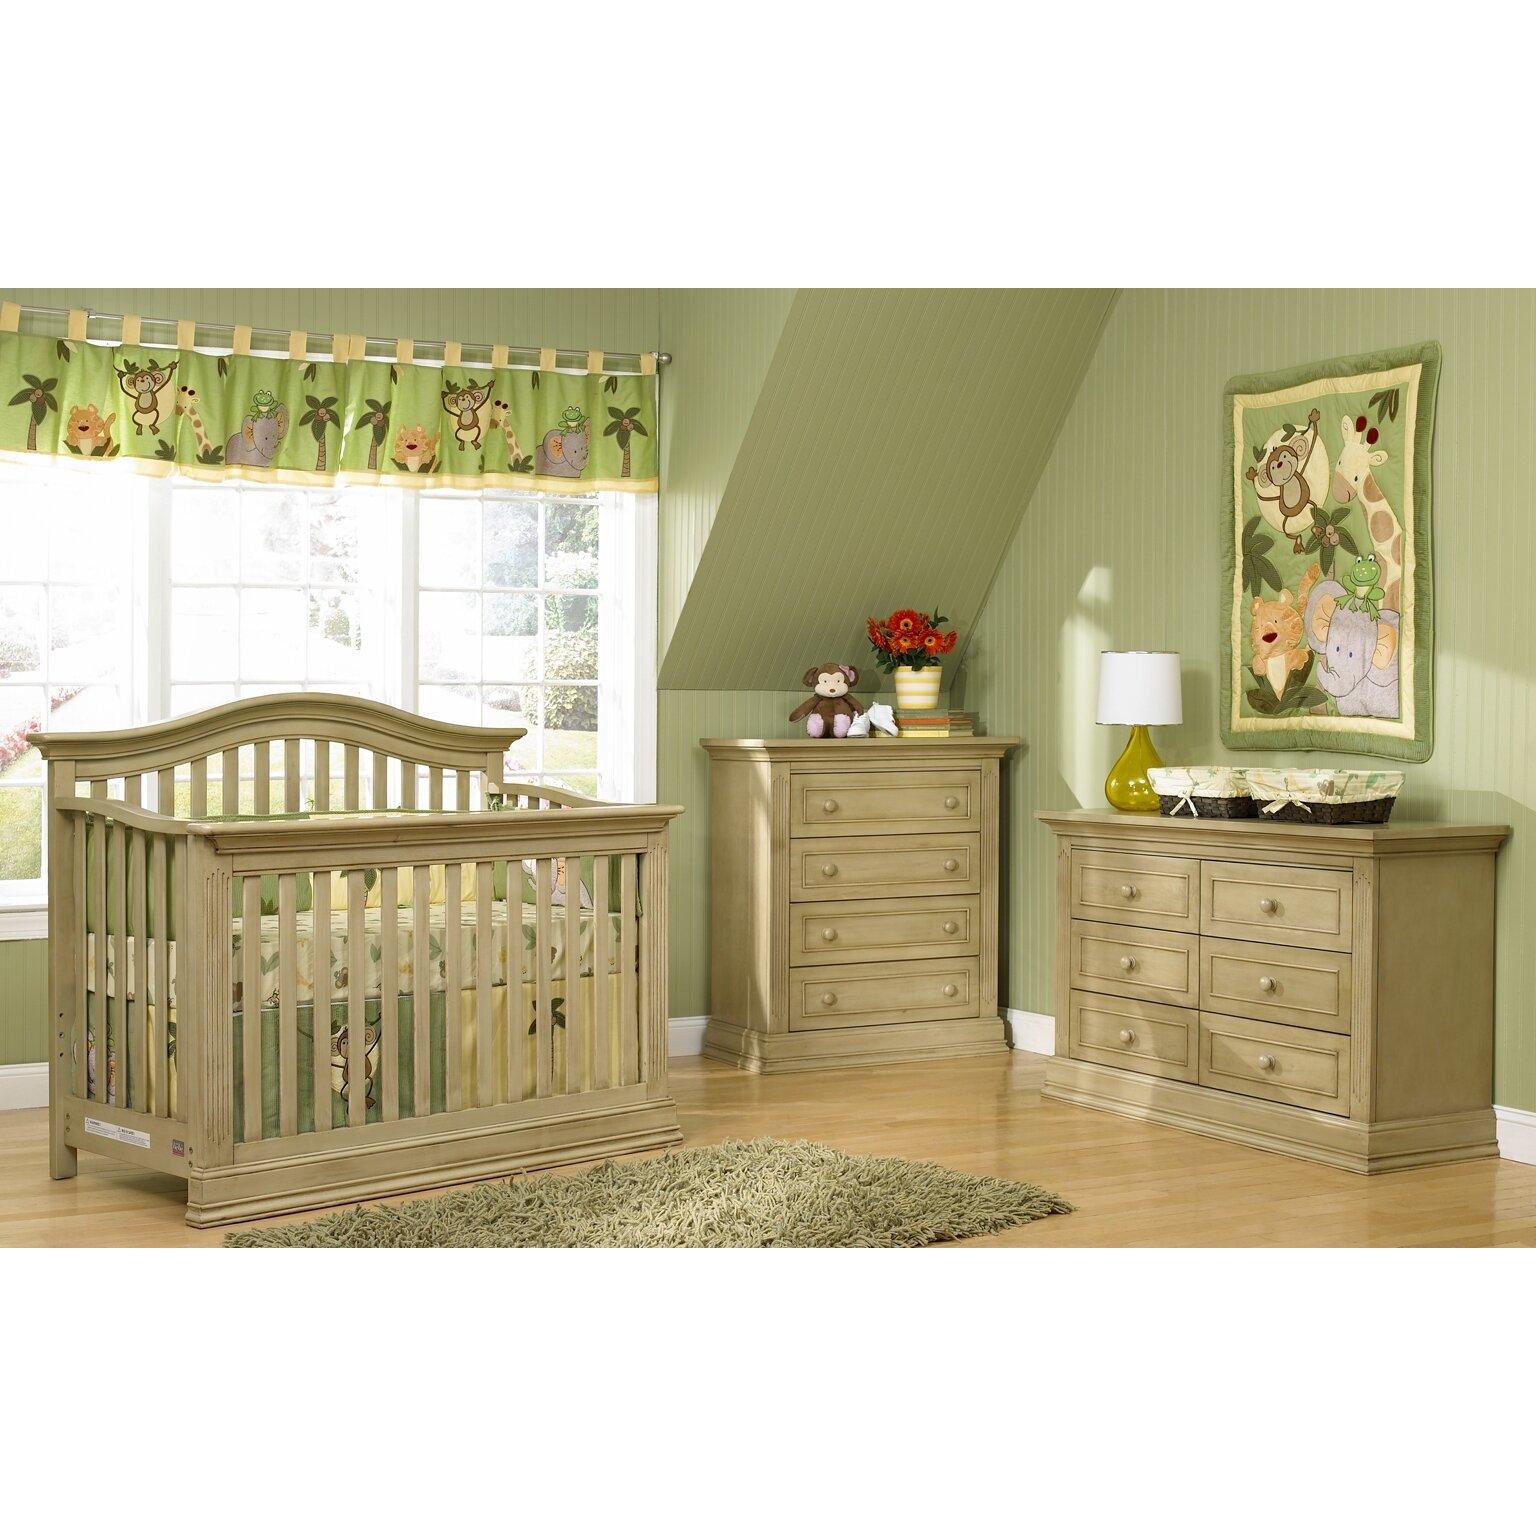 Suite Bebe Dakota Lifetime 4 In 1 Convertible Crib